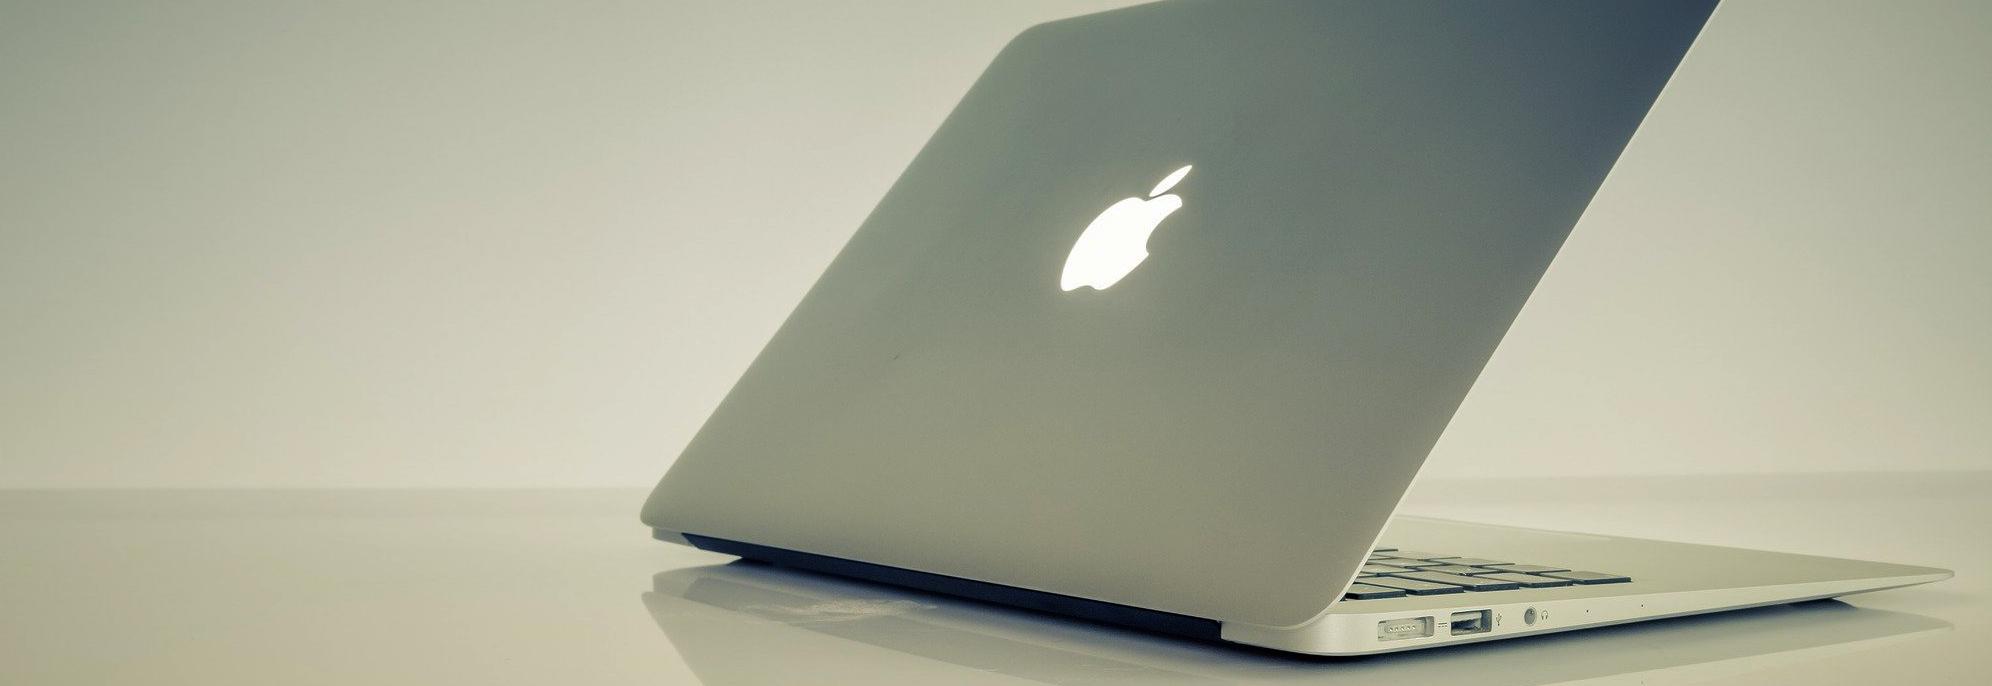 ¿Apple dice adiós a Intel? Apostarán por procesadores propios basados en ARM